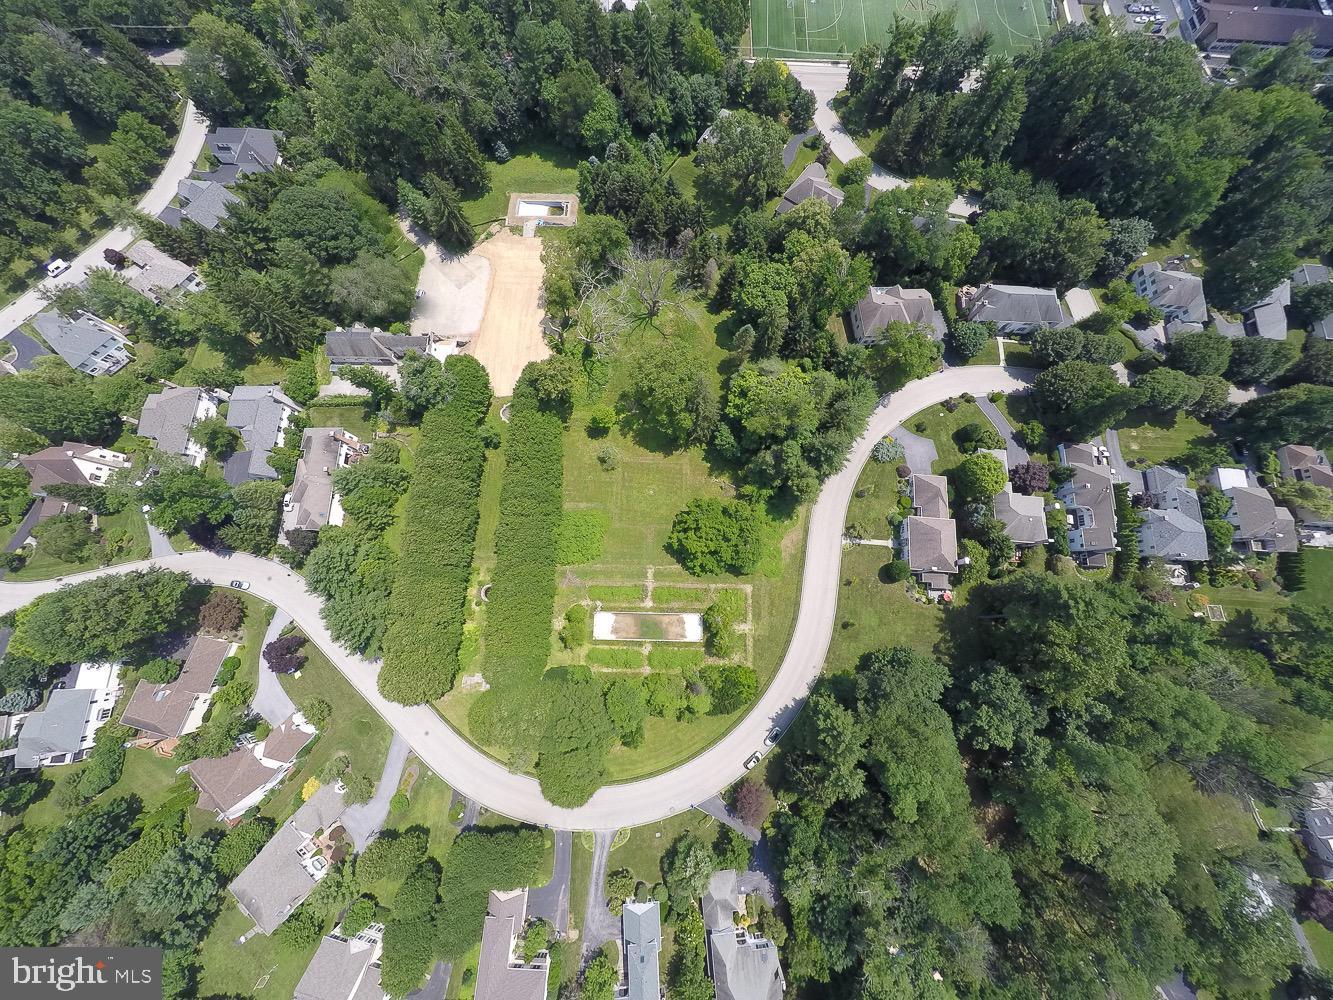 Land for Sale at Villanova, Pennsylvania 19085 United States